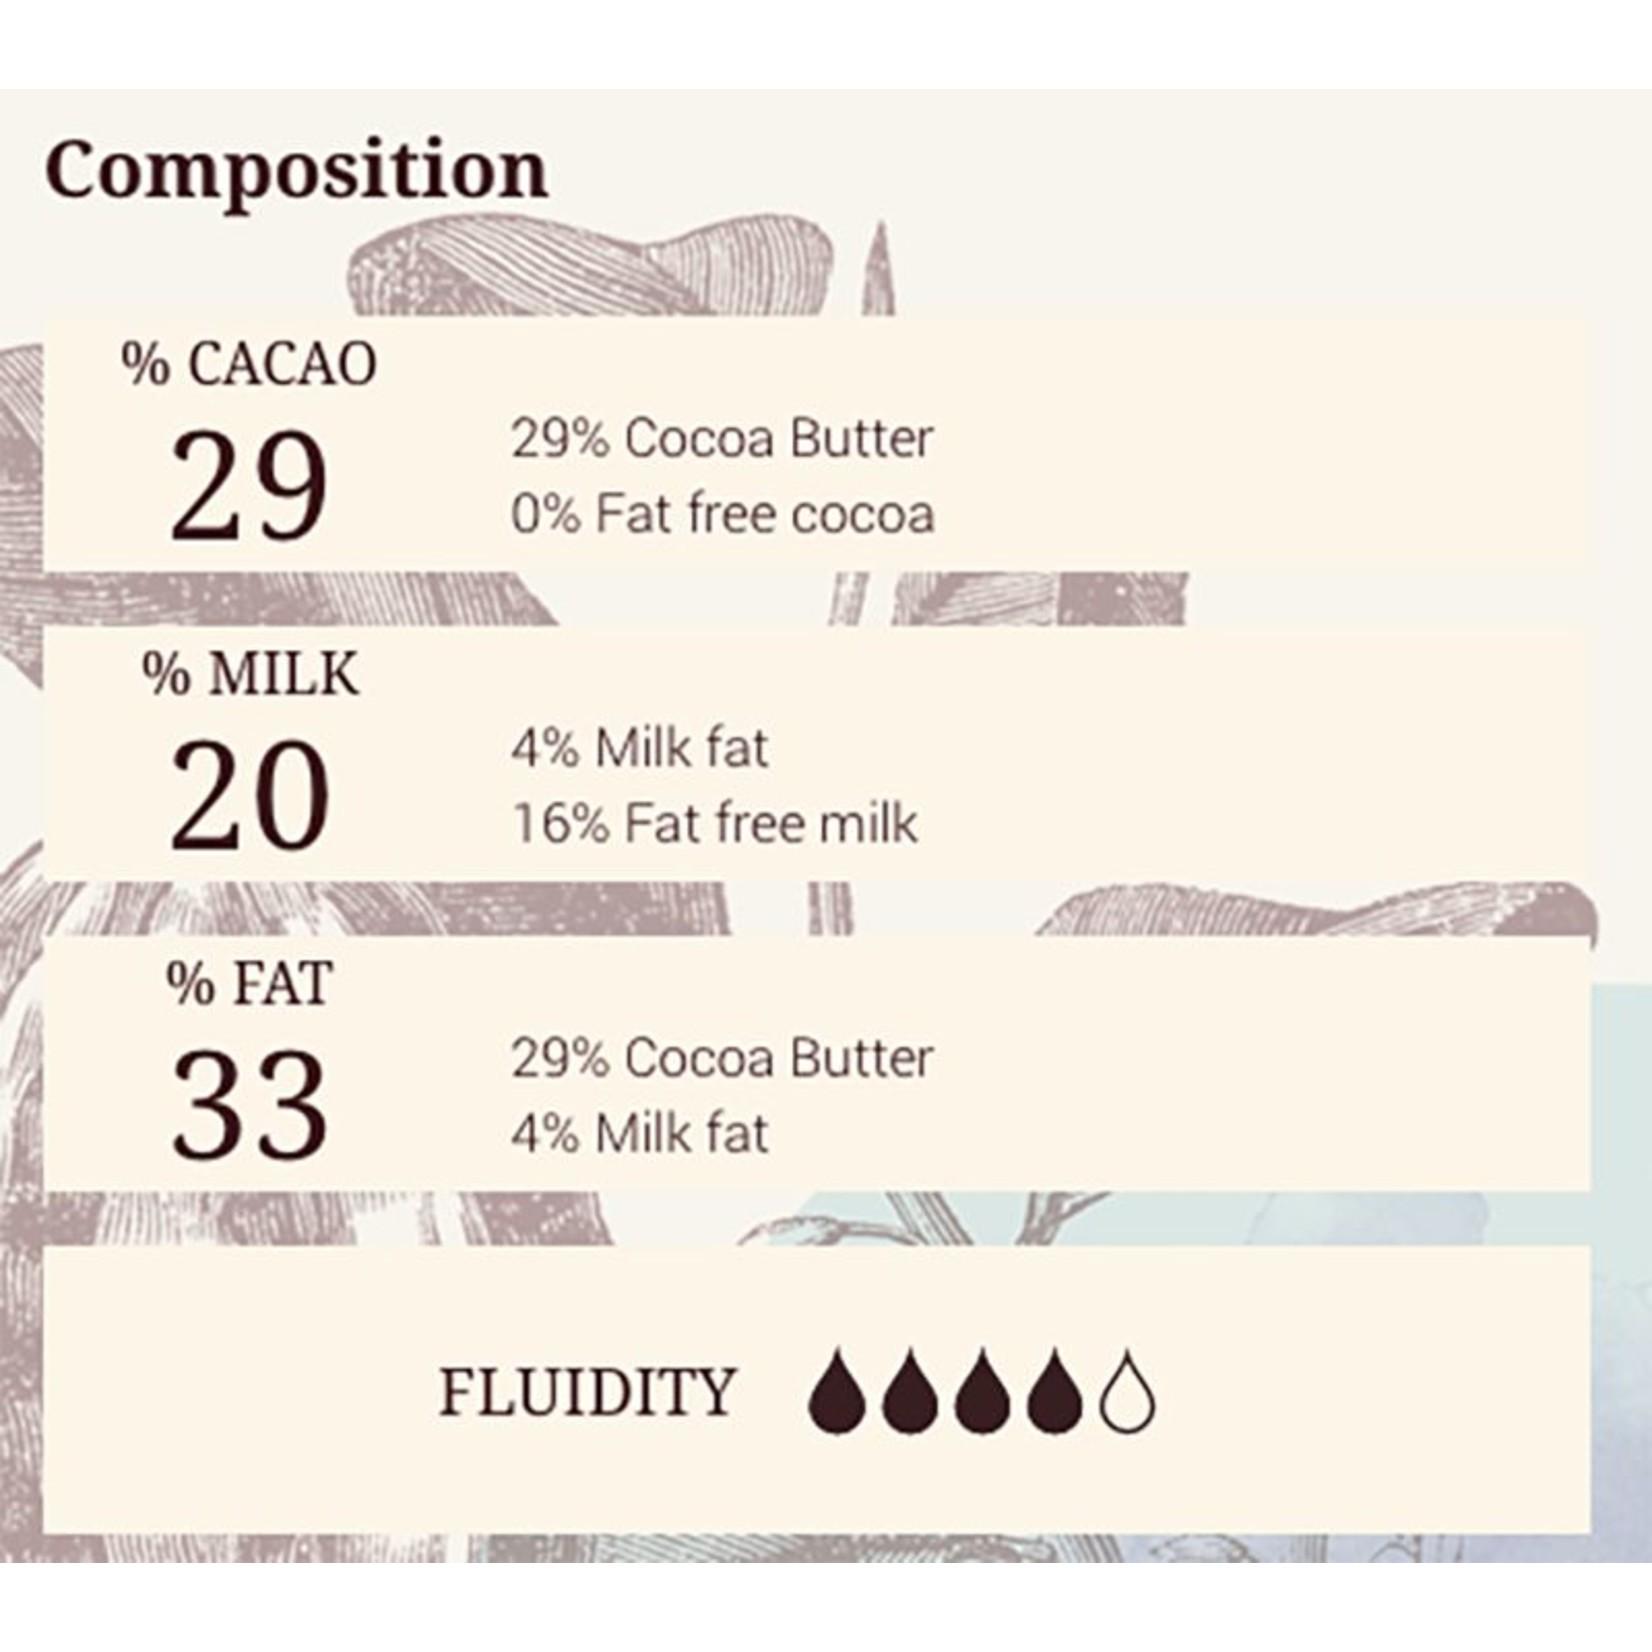 Cacao Barry Cacao Barry - Blanc Satin White Chocolate 29% - 5kg/11 lb, CHW-Q29SATI-US-U77